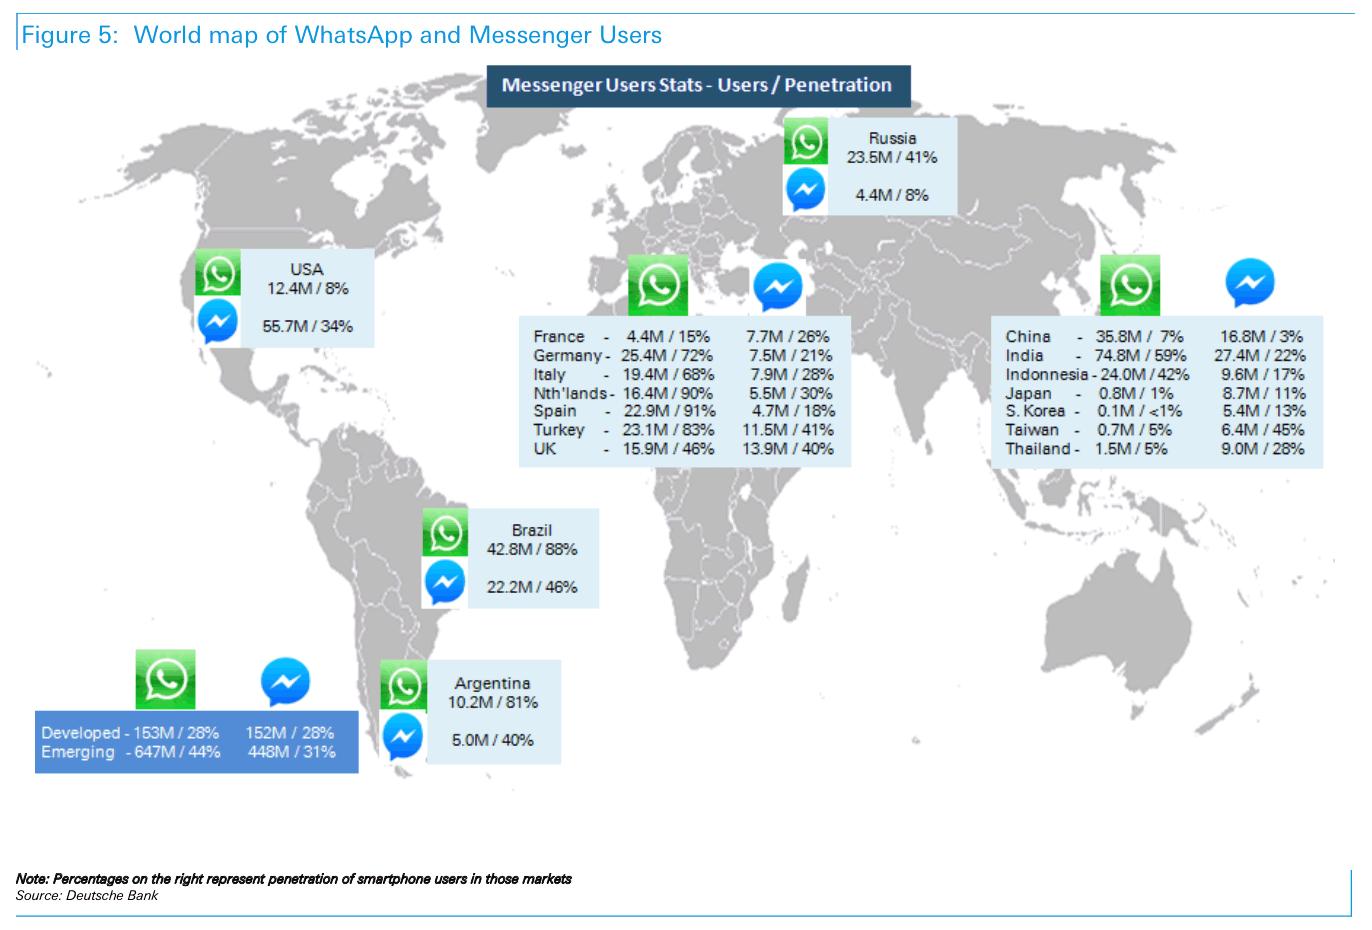 WhatsApp Reaches 1 Billion Daily Active Users | Social Media Today